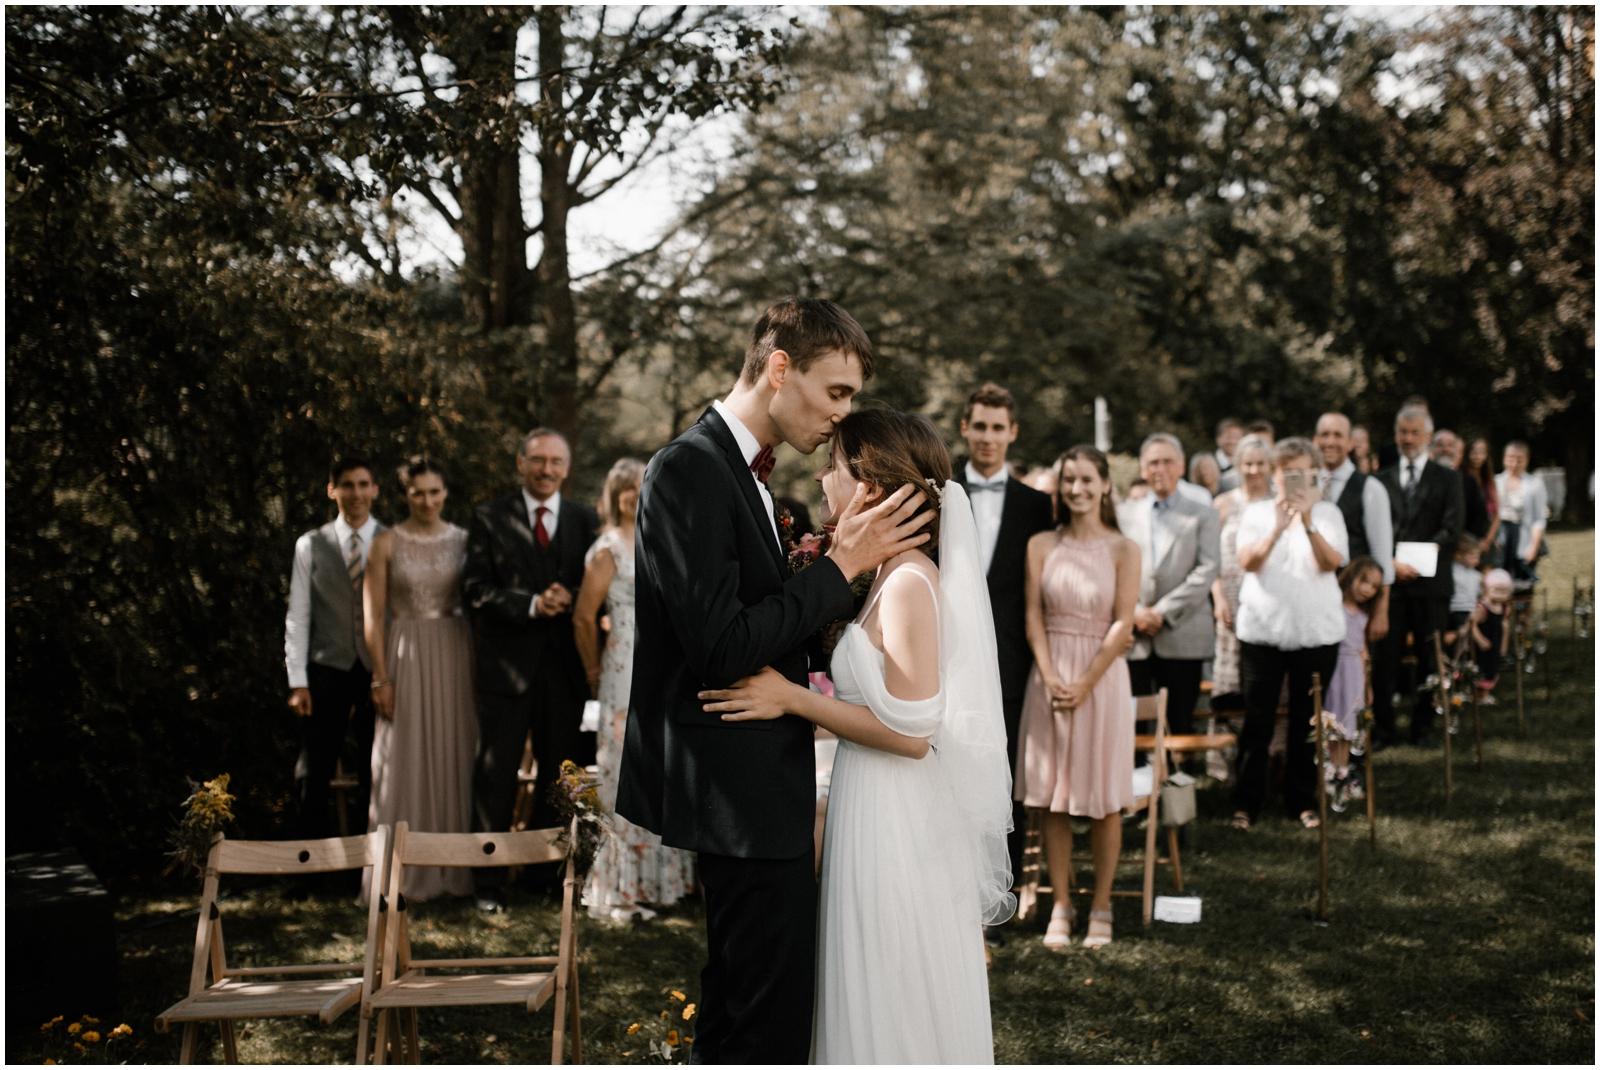 mirjam_thomas_wedding-324.jpg